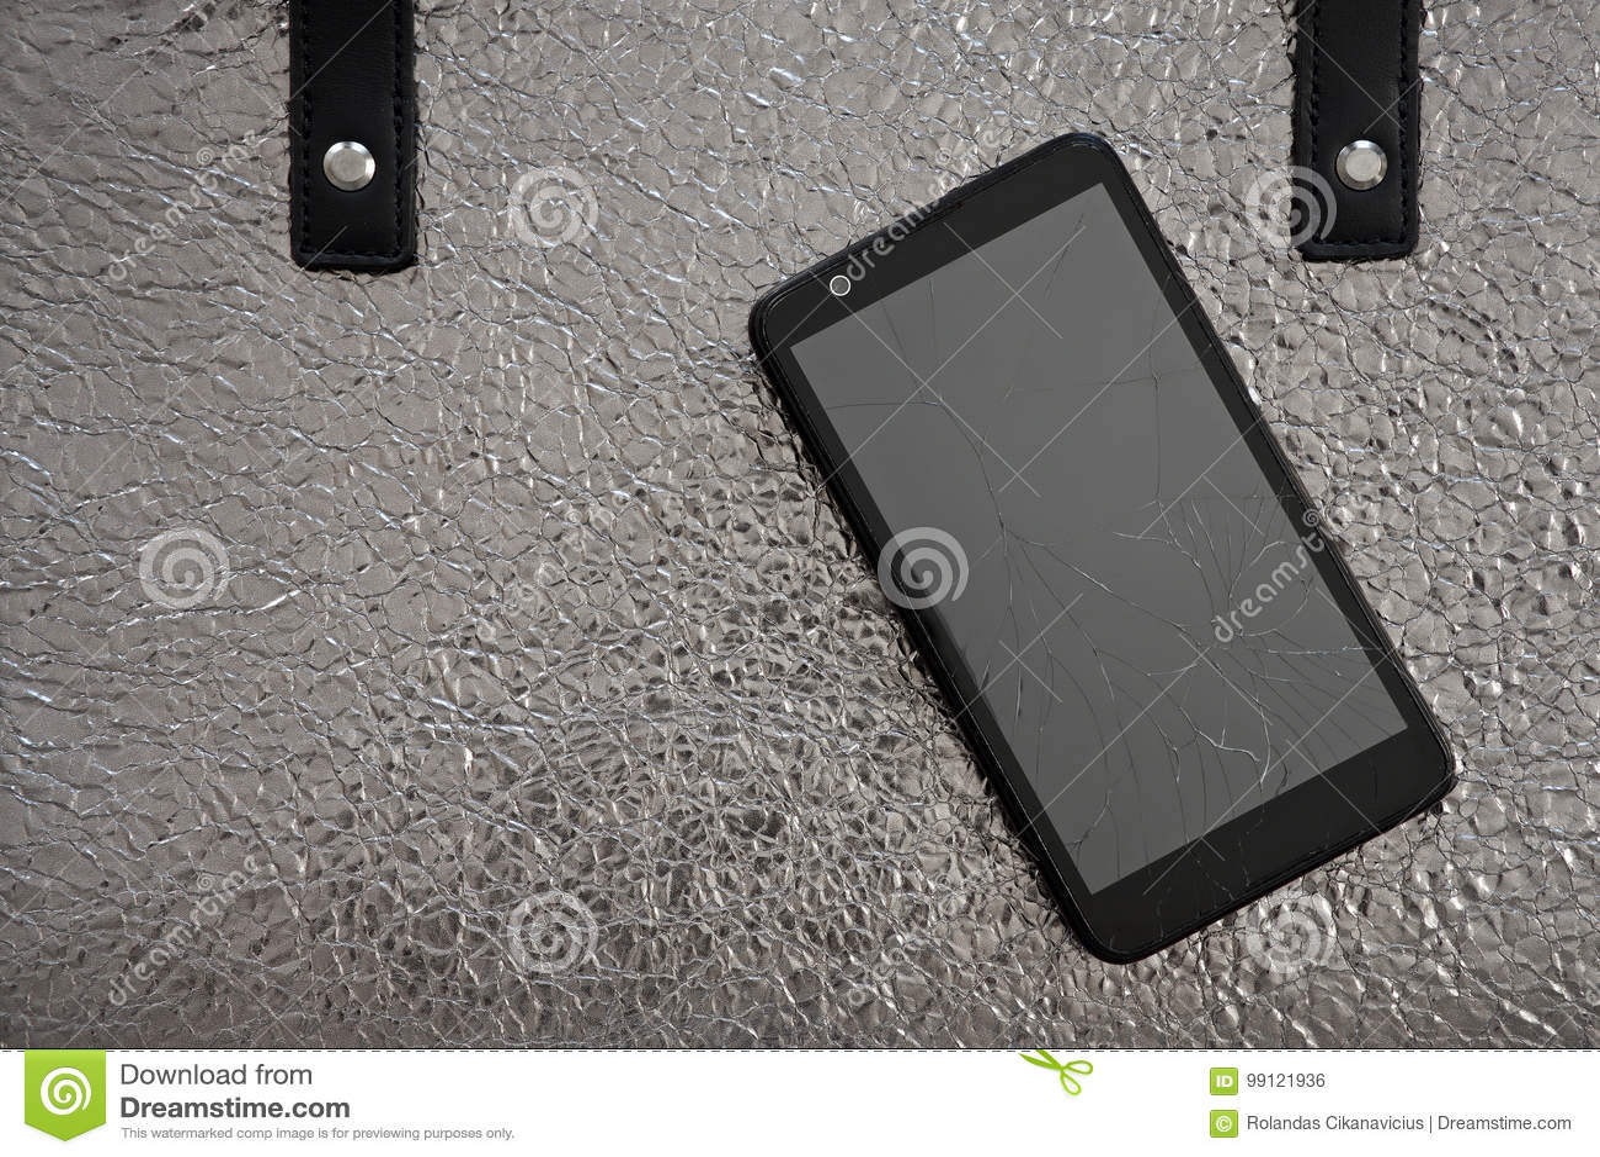 Broken glass of smart phone on leather bag